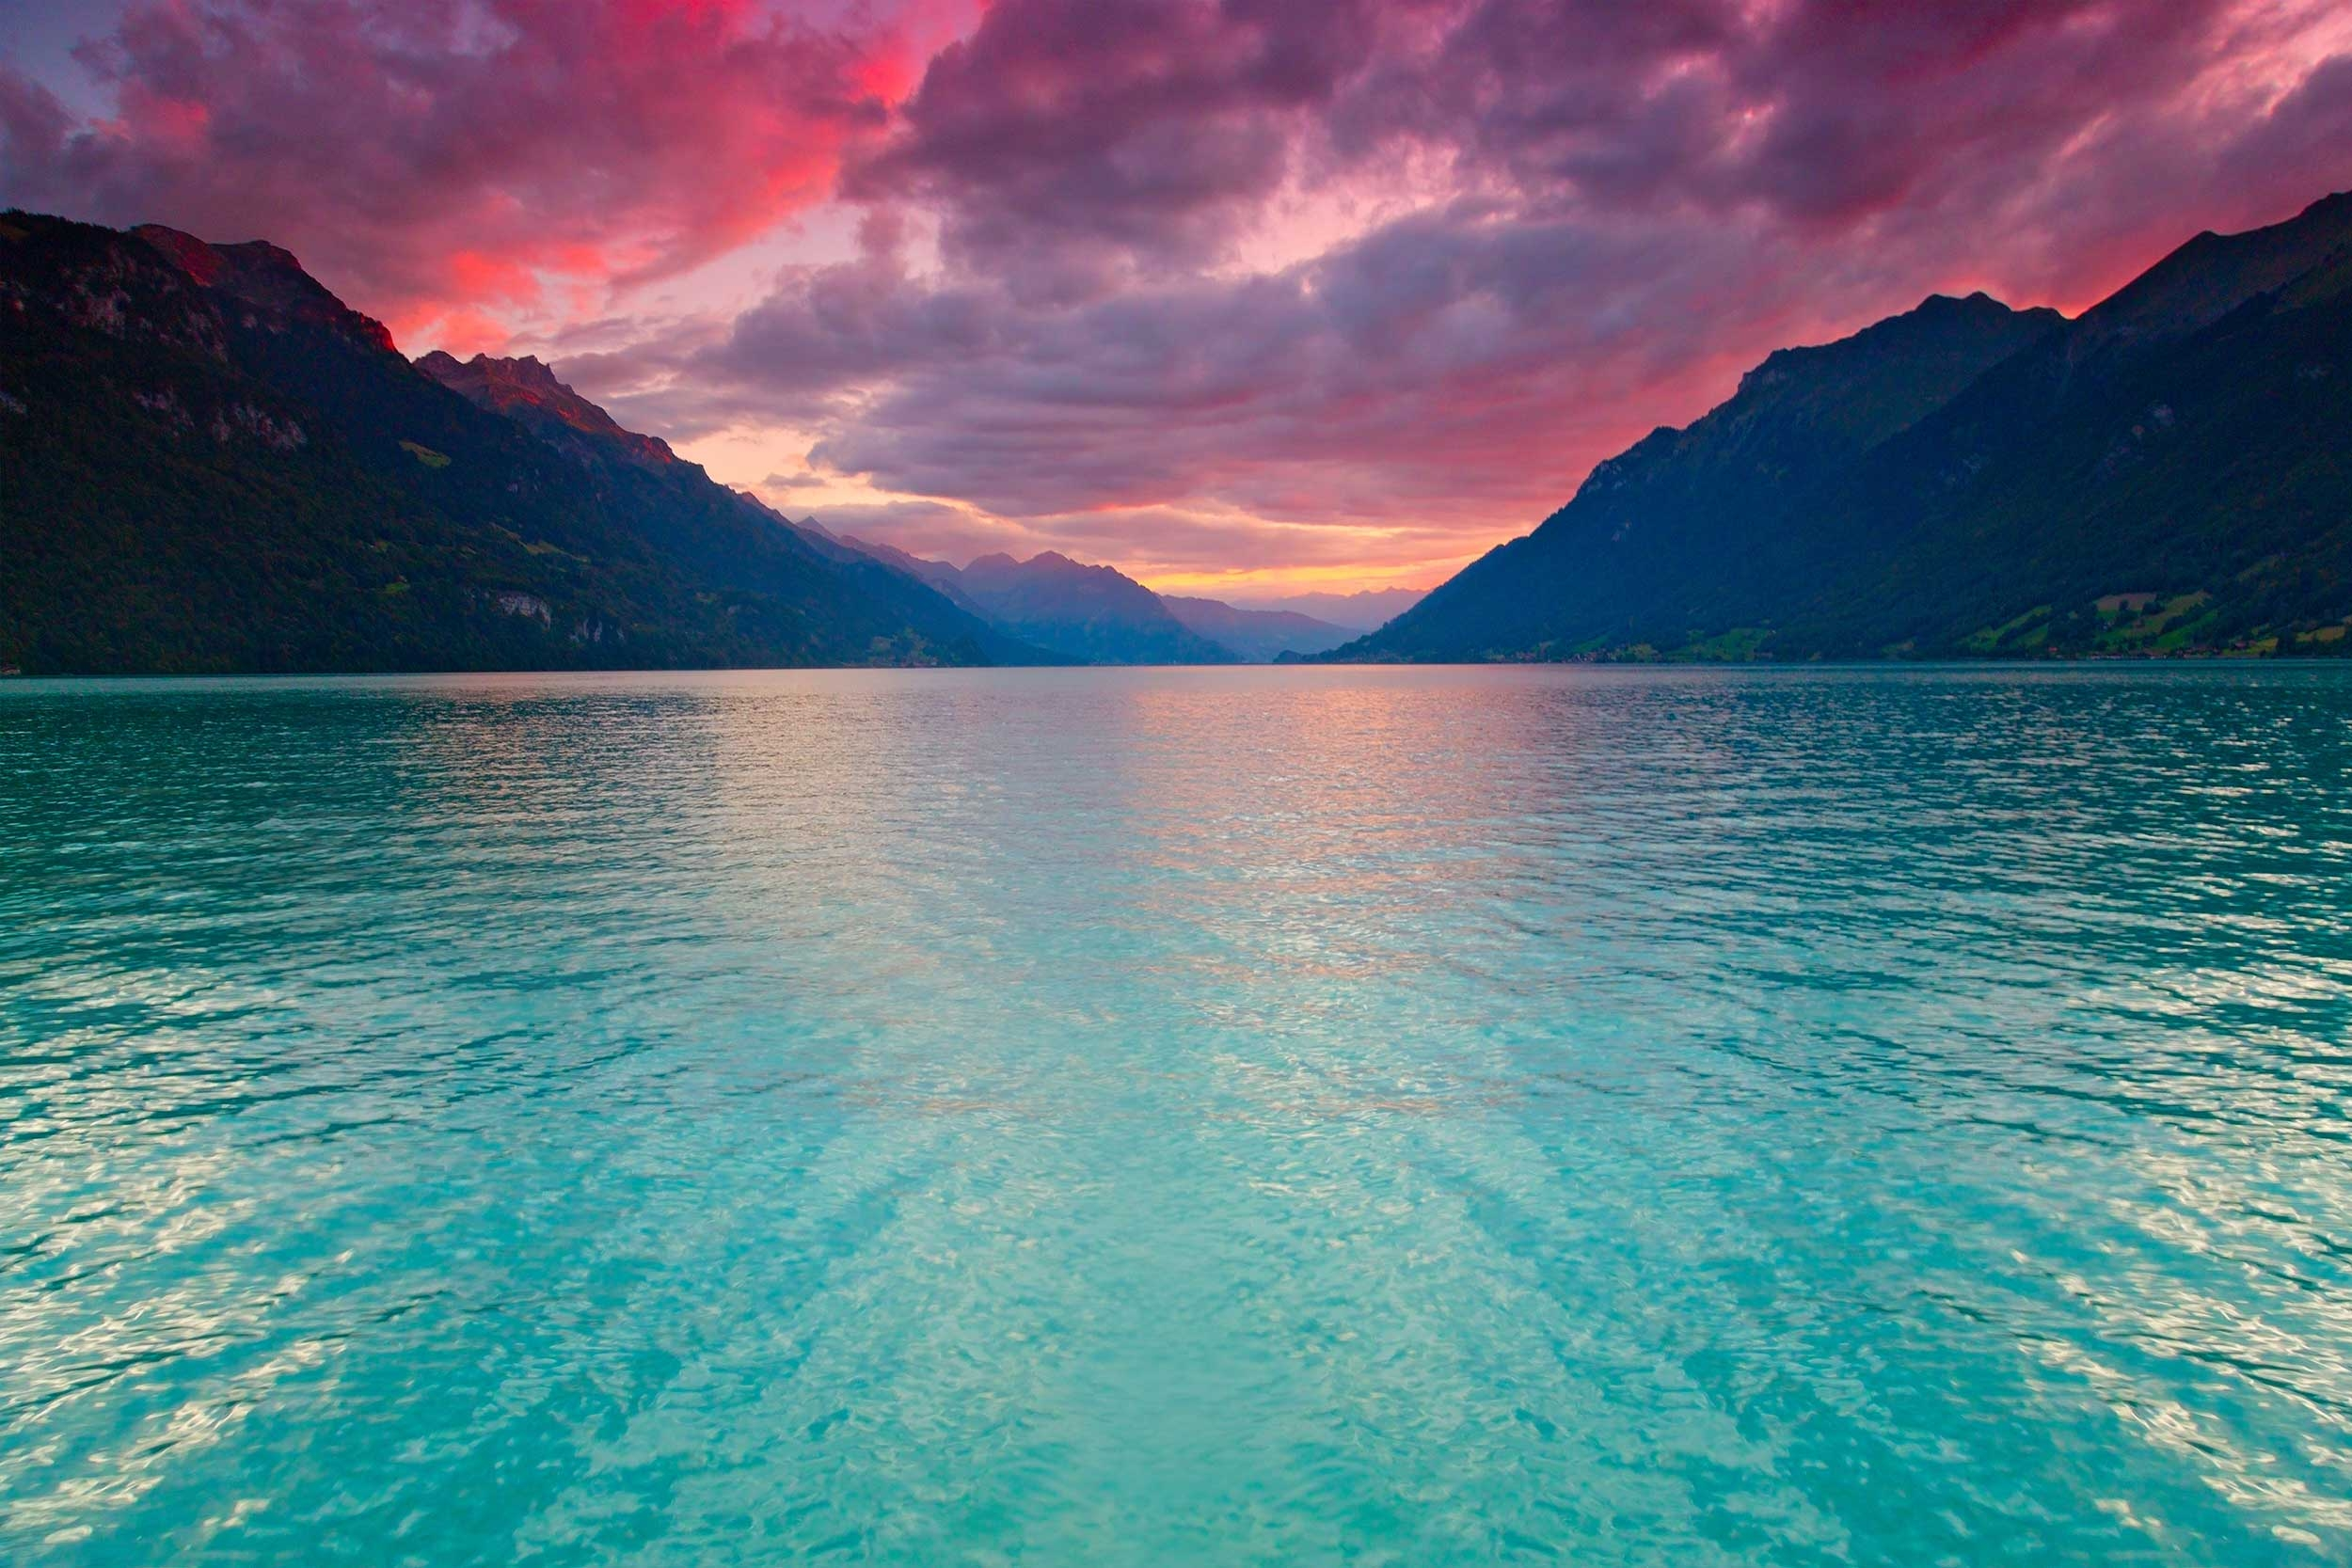 سويسرا انترلاكن اهم الاماكن السياحيه بحيره برينز